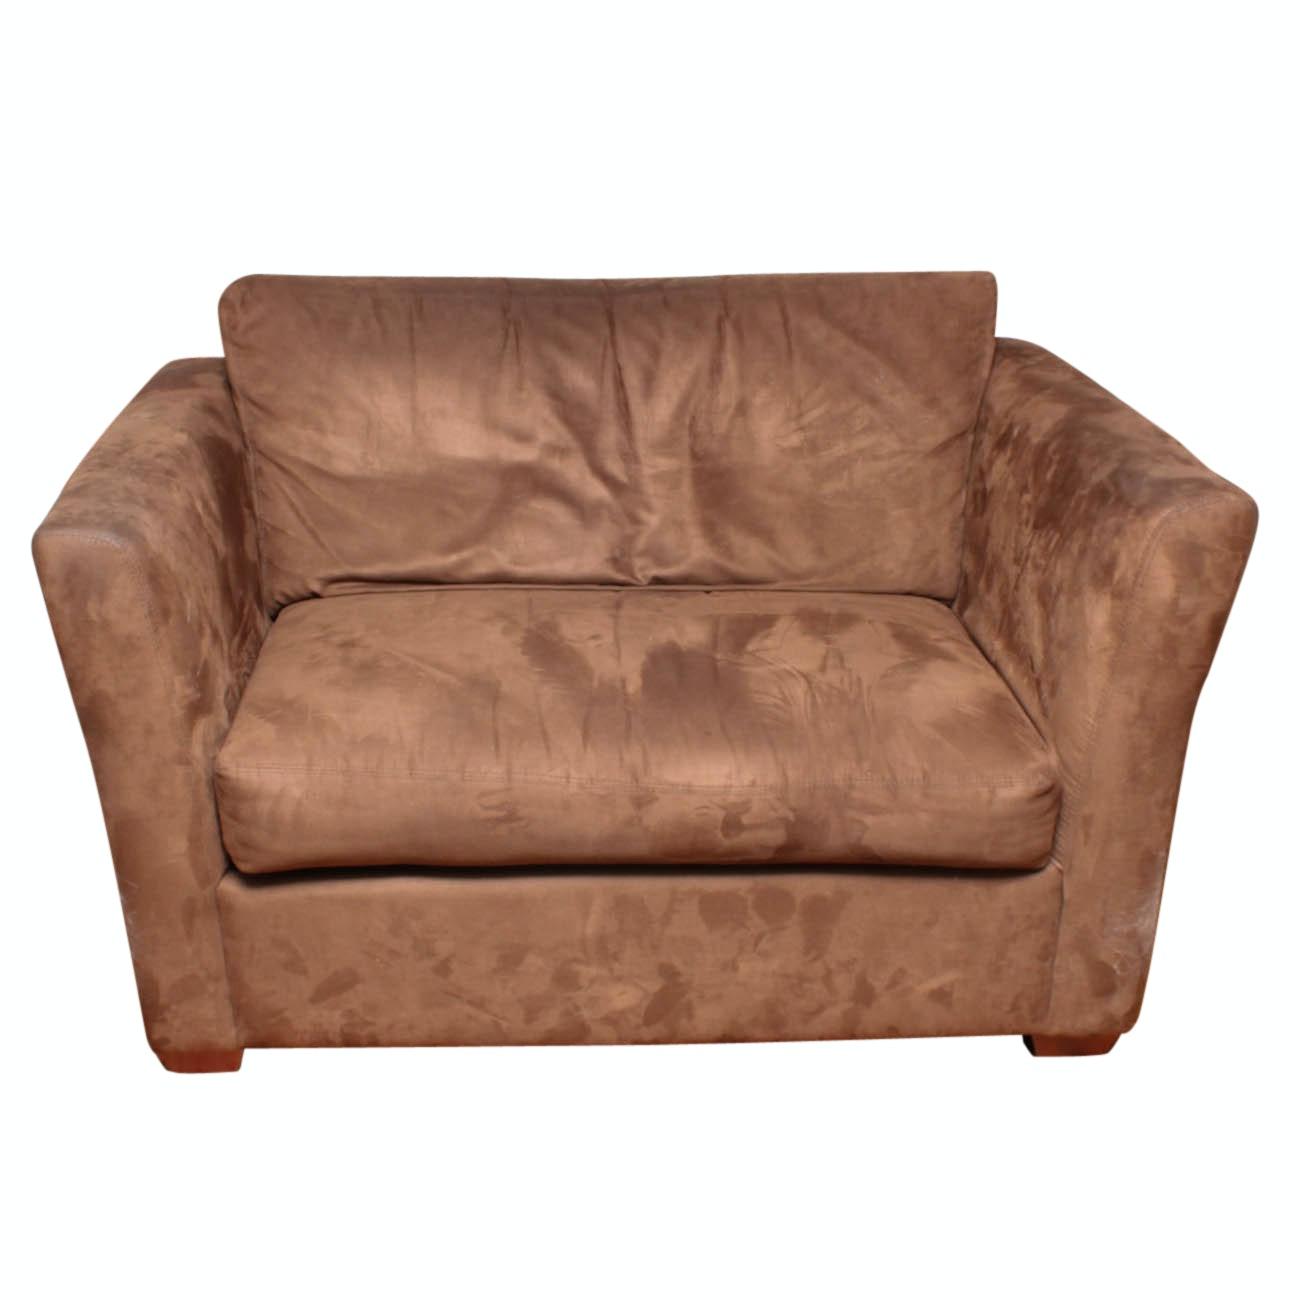 Sofa Express Loveseat